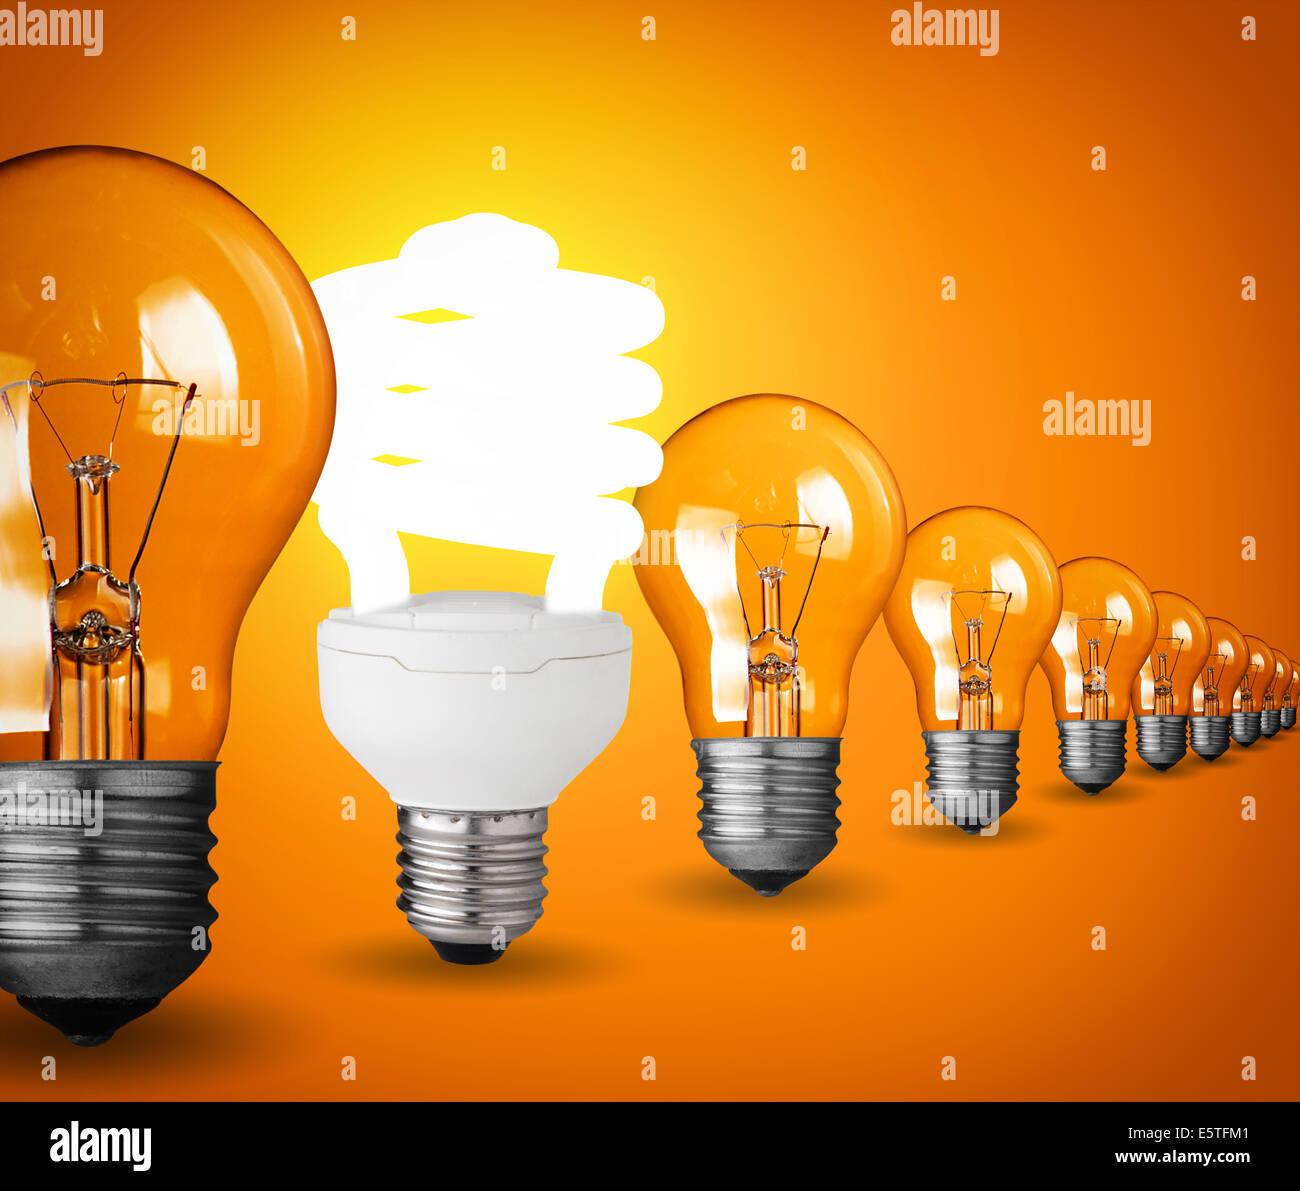 Idea concept with light bulbs on orange background - Stock Image